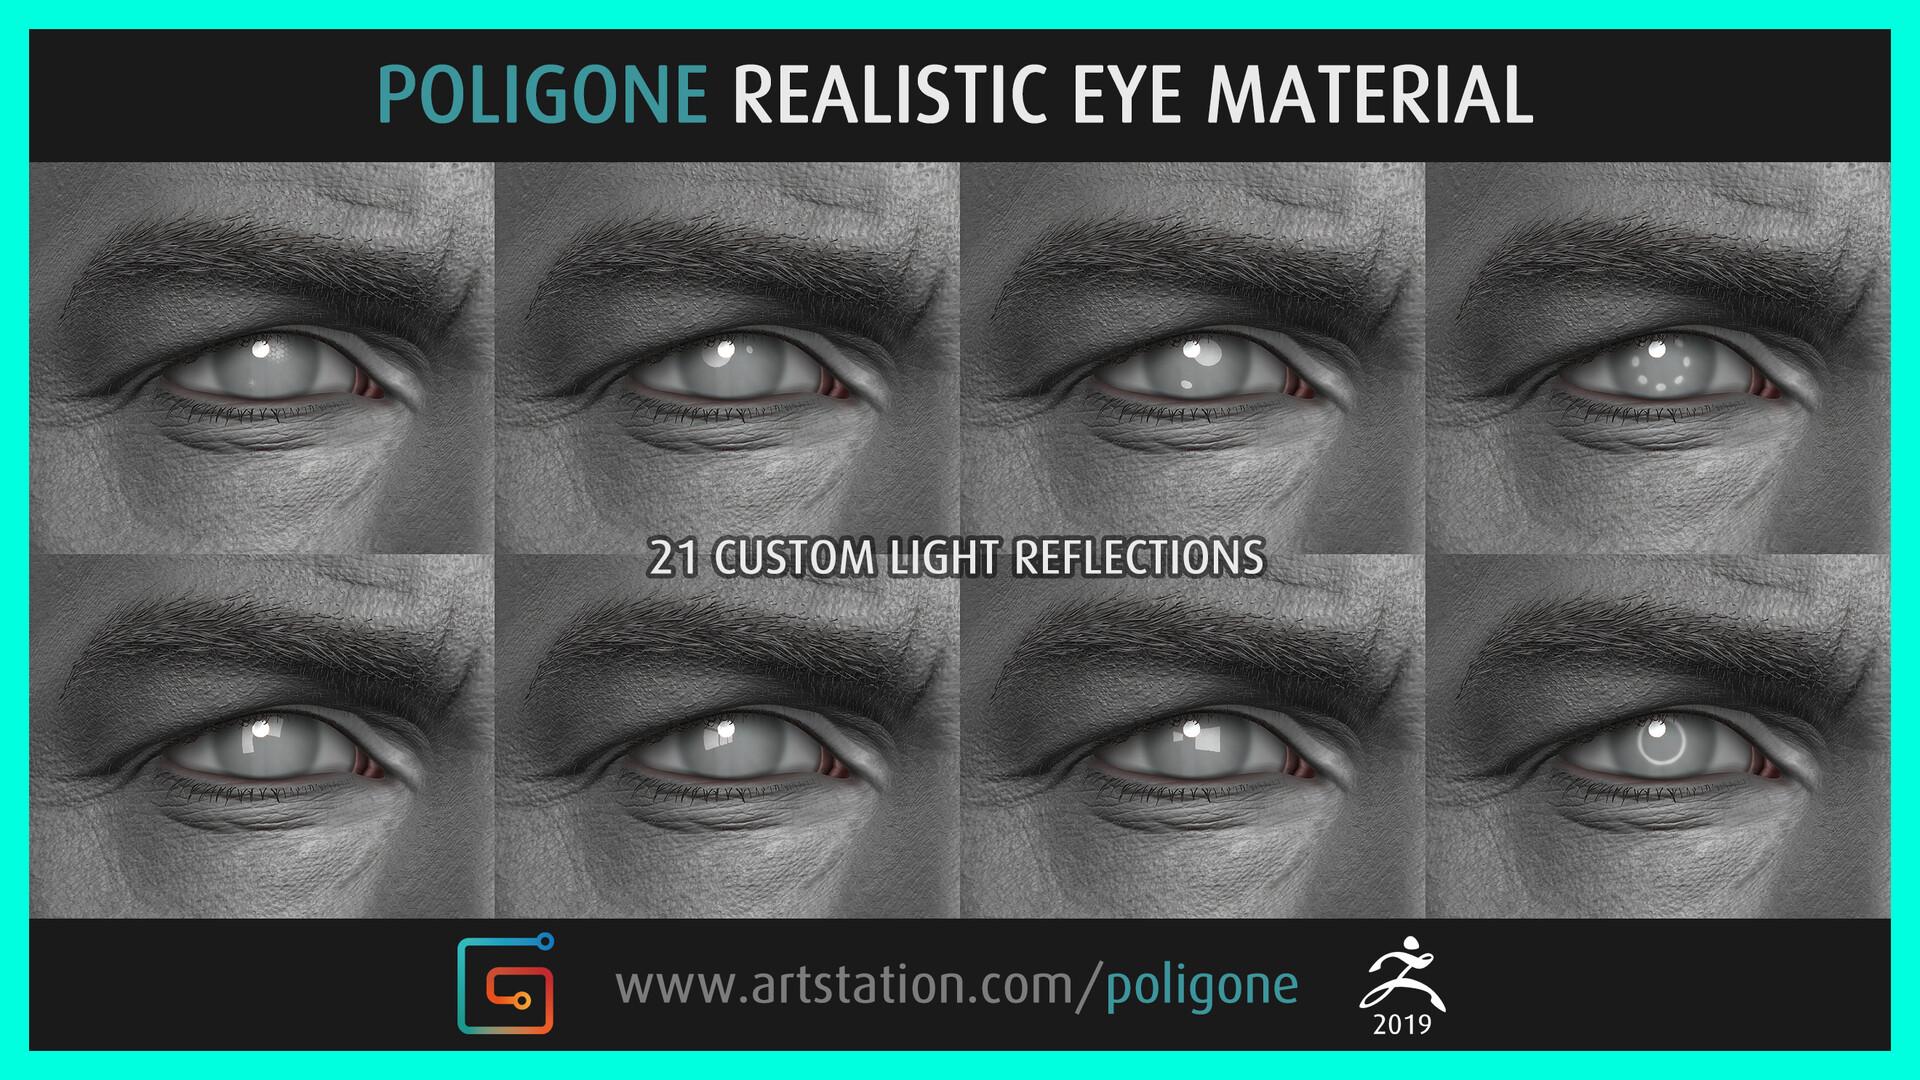 Poligone cg 8